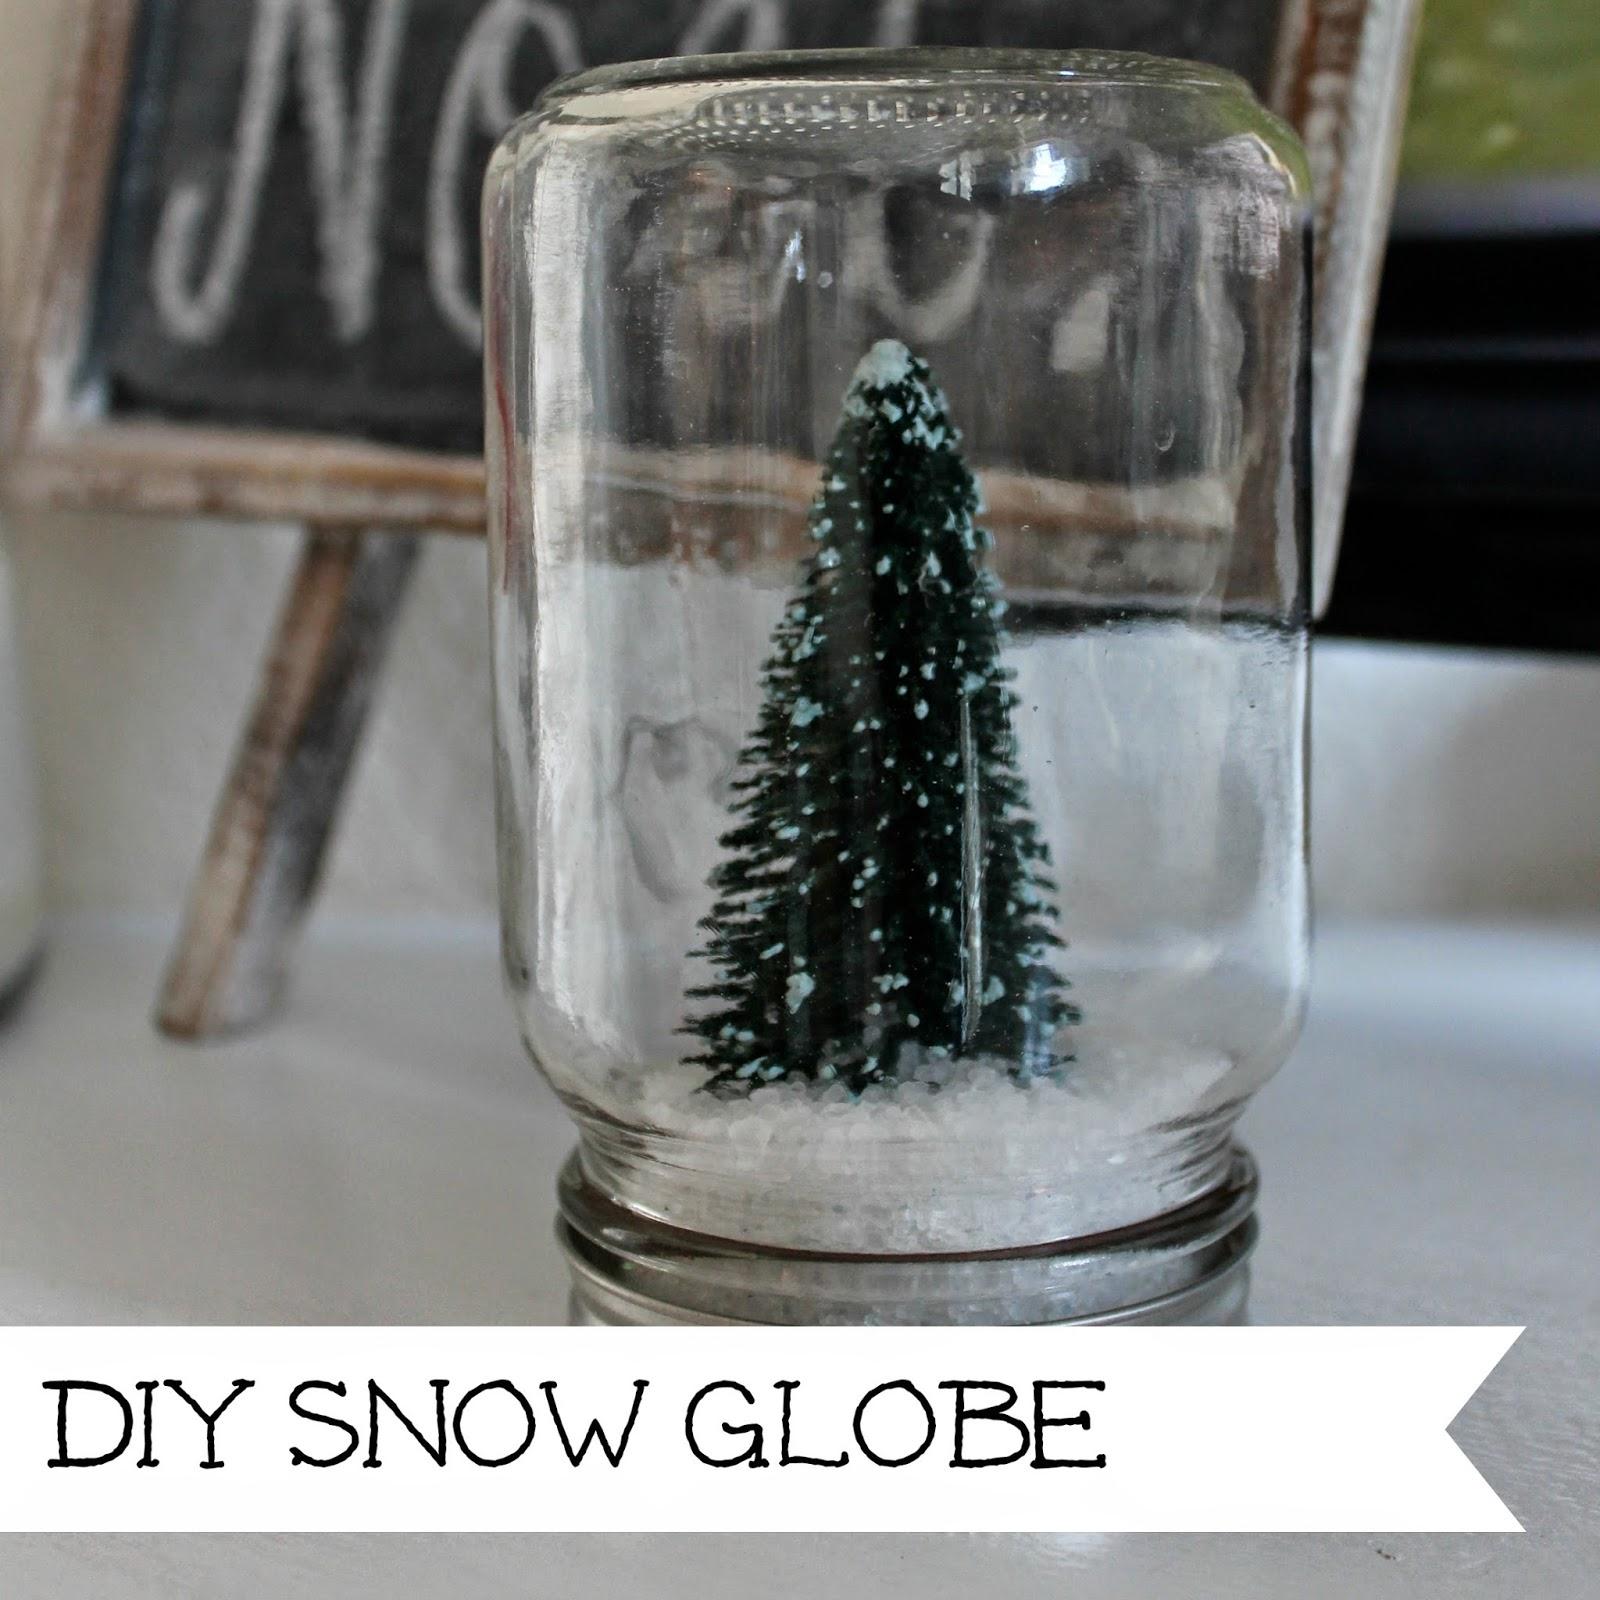 http://wonderfullymadebyleslie.blogspot.com/2013/12/diy-snow-globes.html